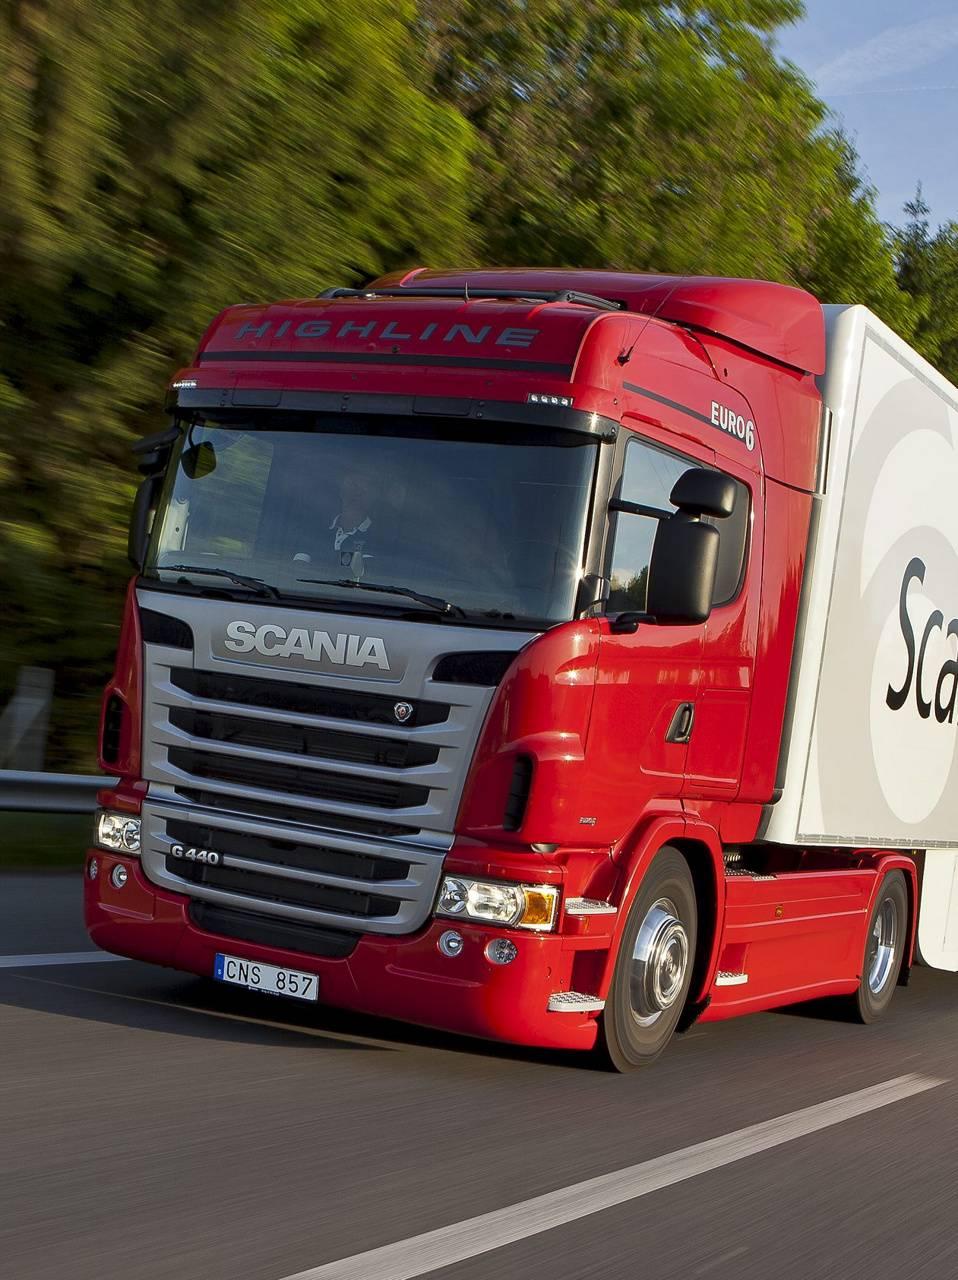 Scania Truck Wallpaper By Robikacika14 8e Free On Zedge